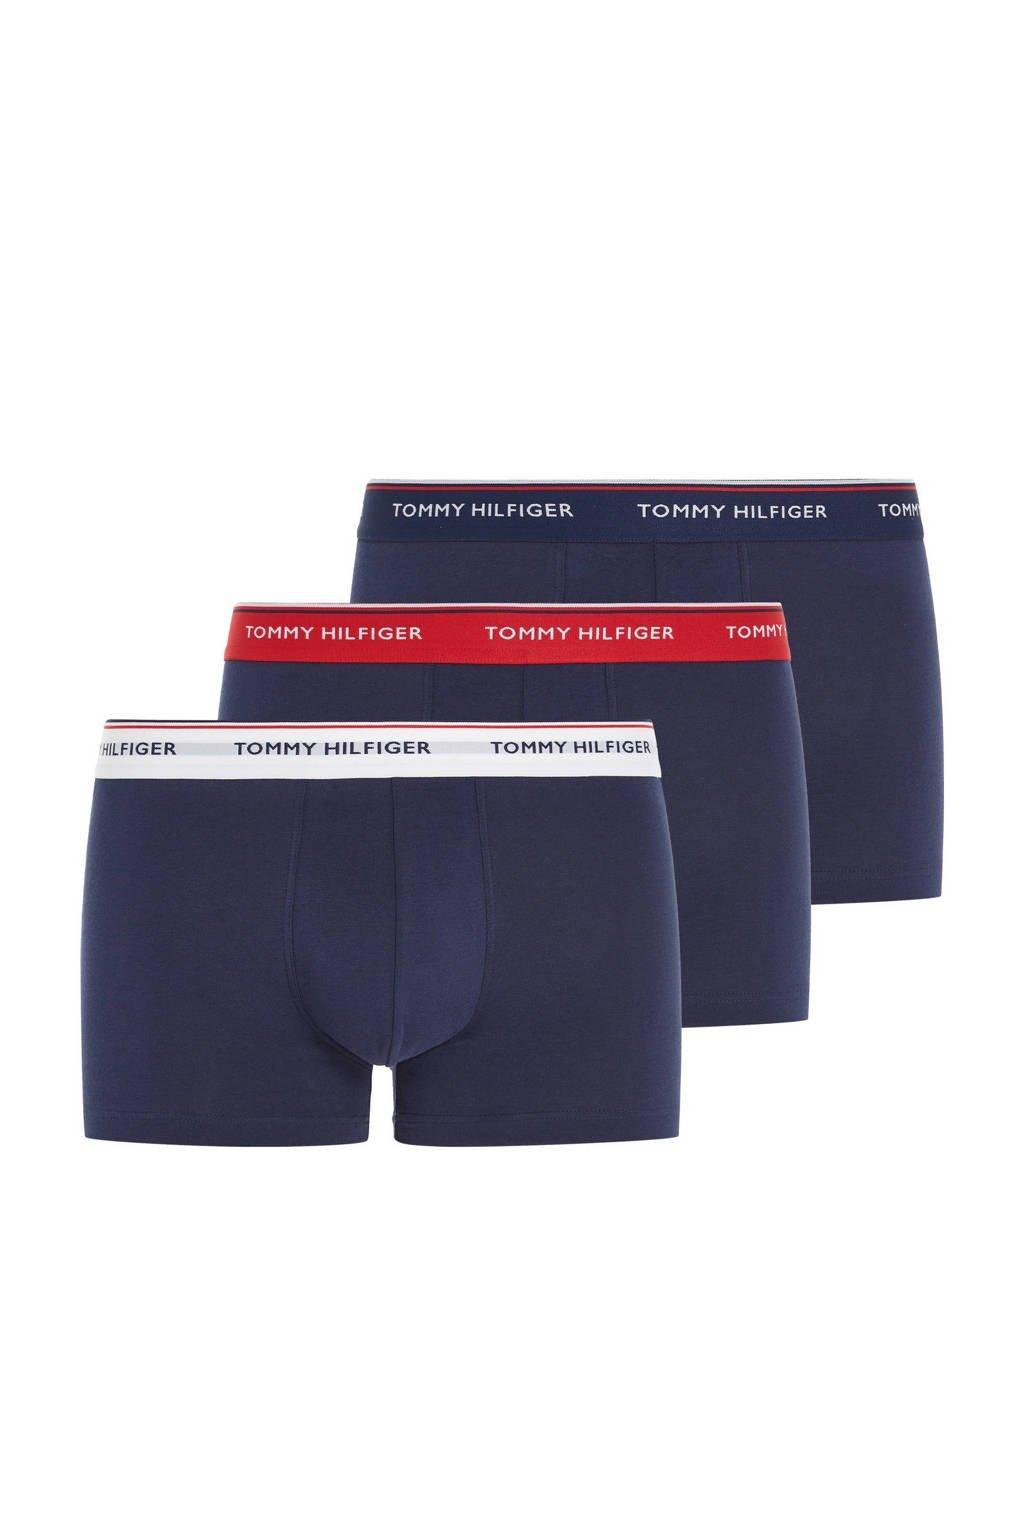 Tommy Hilfiger boxershort (set van 3), Donkerblauw